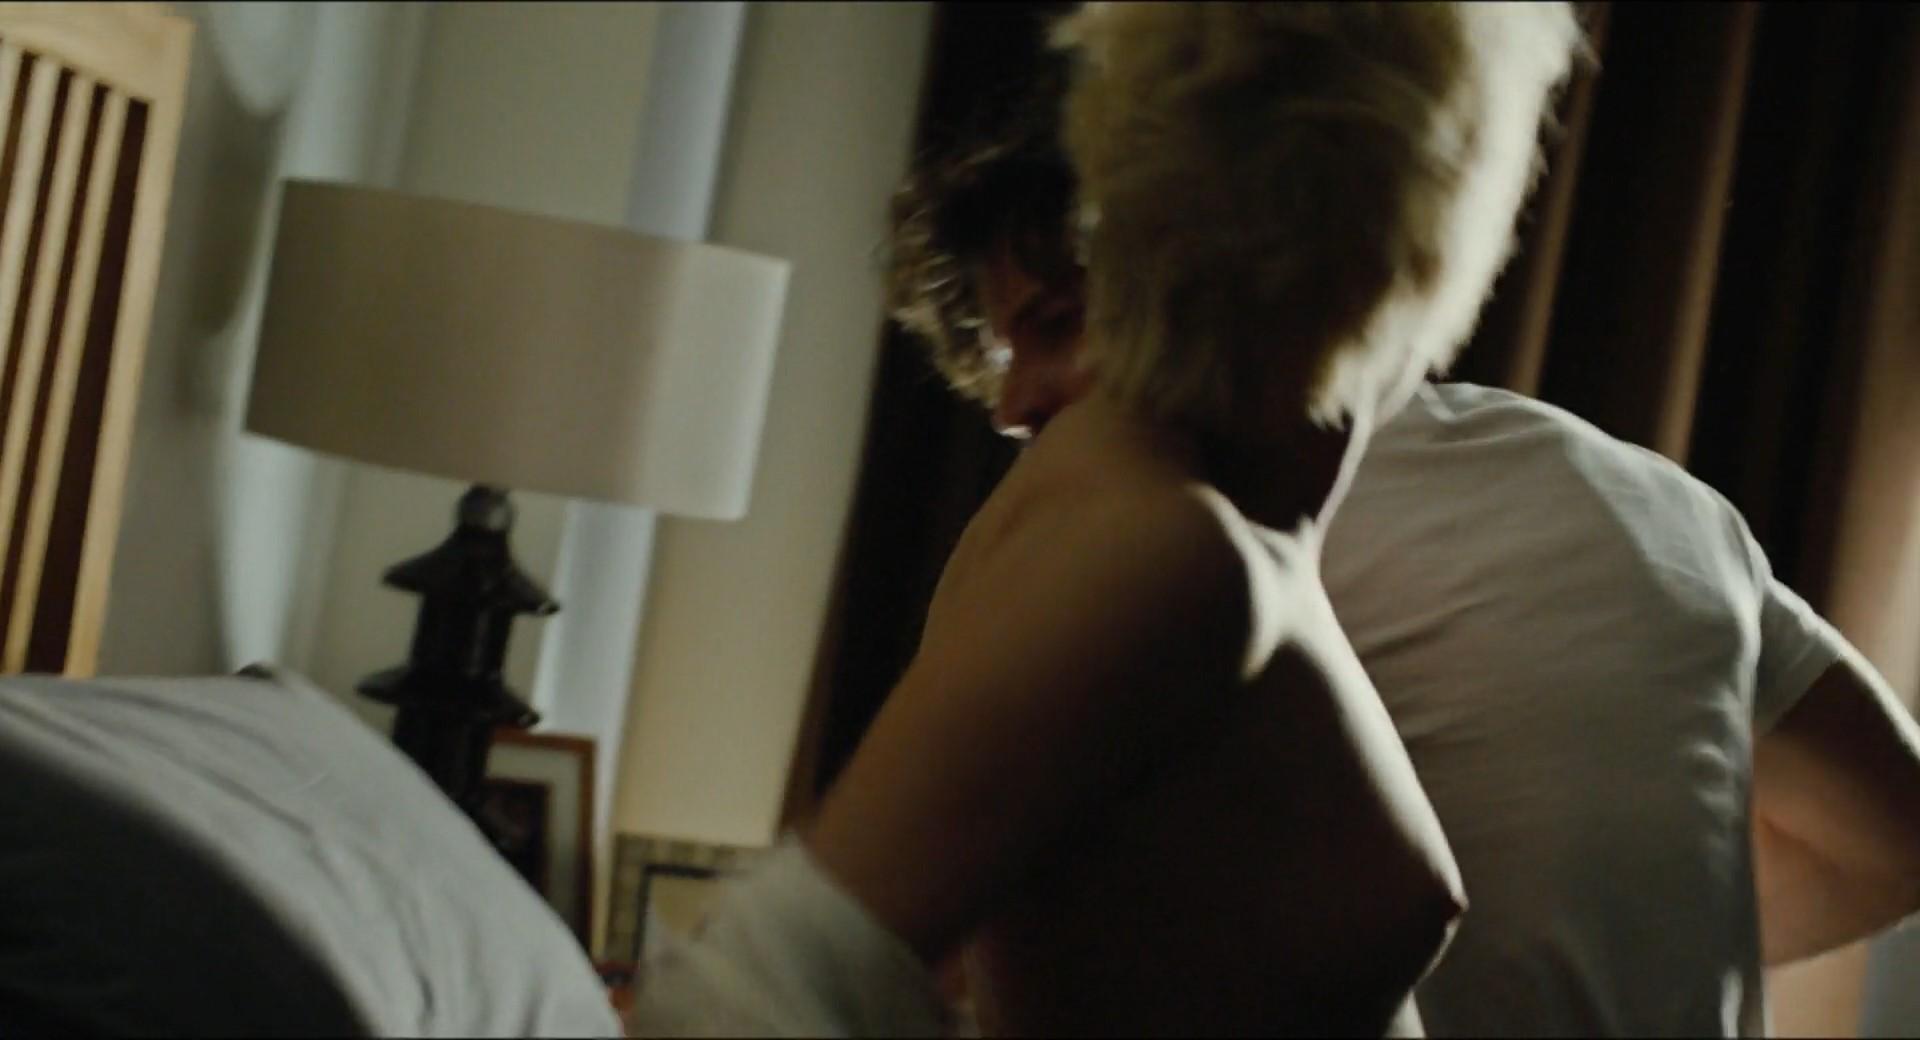 Adriana Ugarte fotos desnuda hackeadas